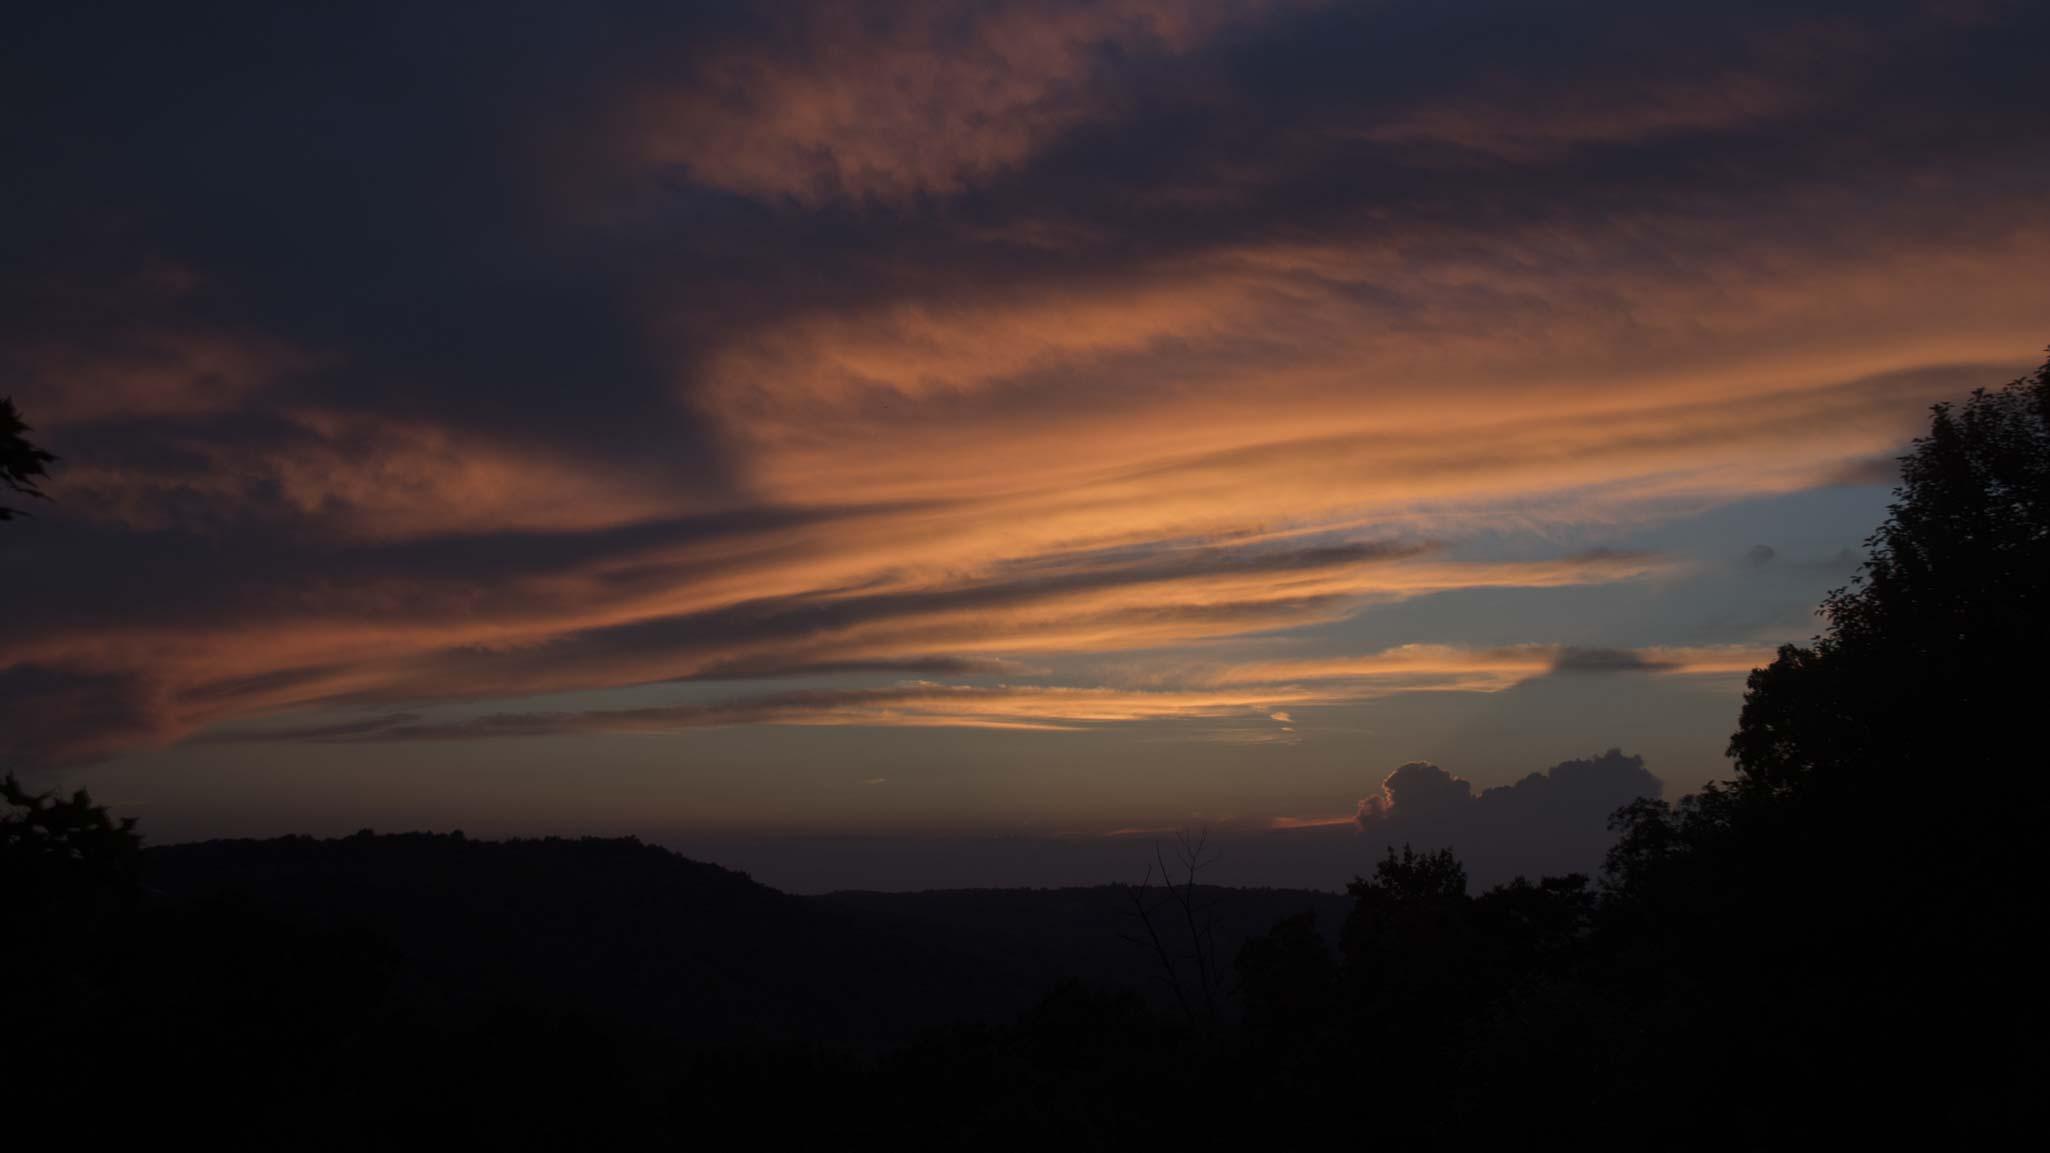 0802 Sunset 1 (2 of 2)